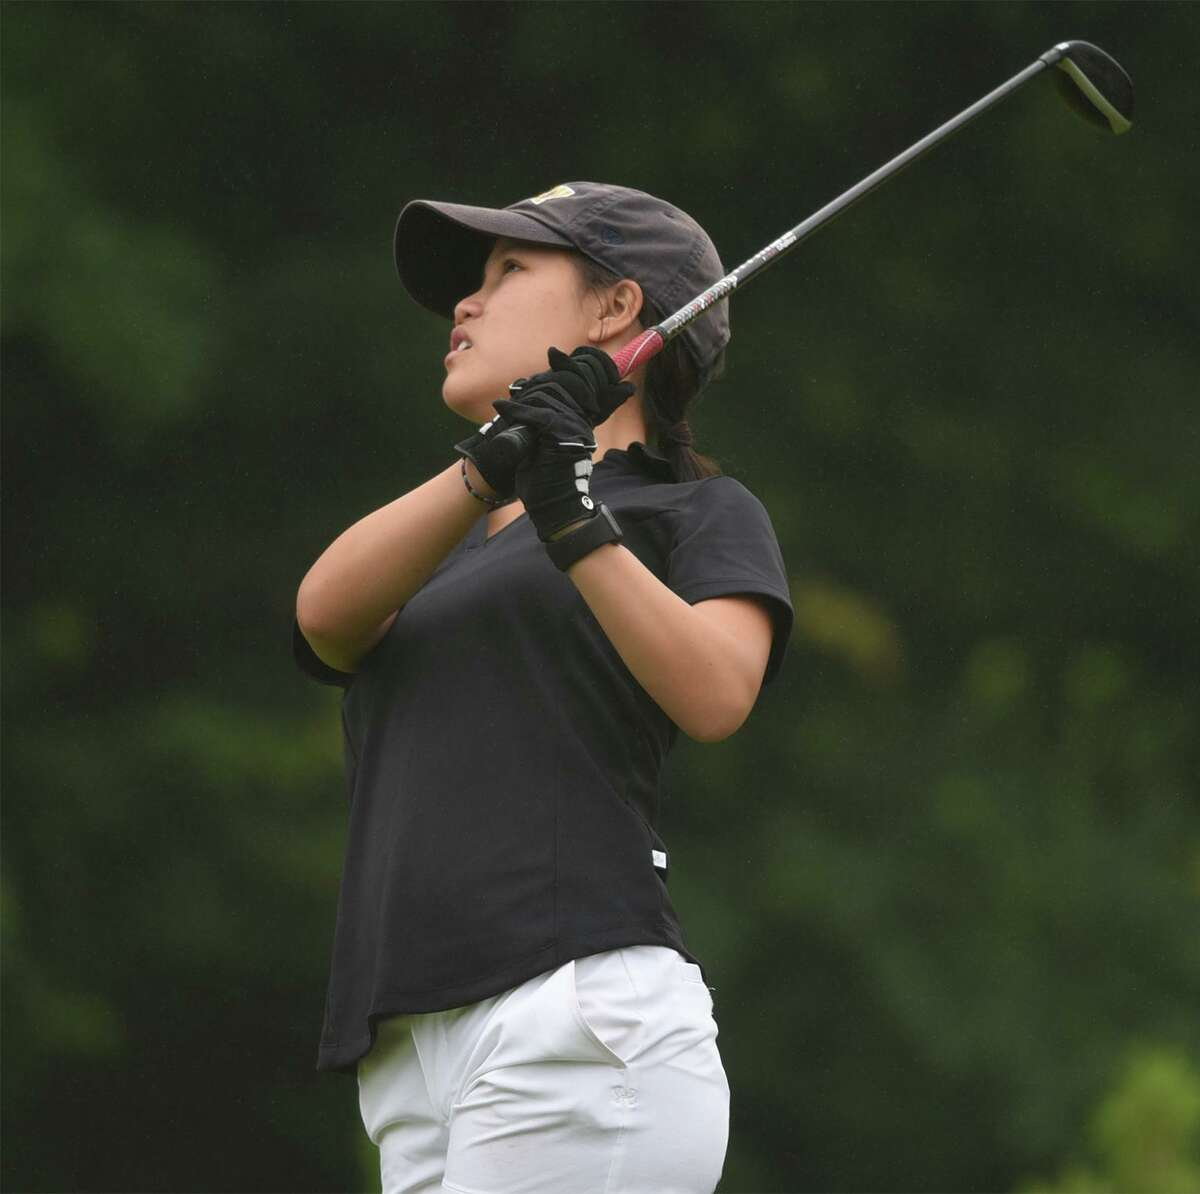 New Canaan senior co-captain Julia Bazata tees off on the 12th hole during the FCIAC girls golf championship at Fairchild Wheeler Golf Course on Thursday, June 3, 2021.